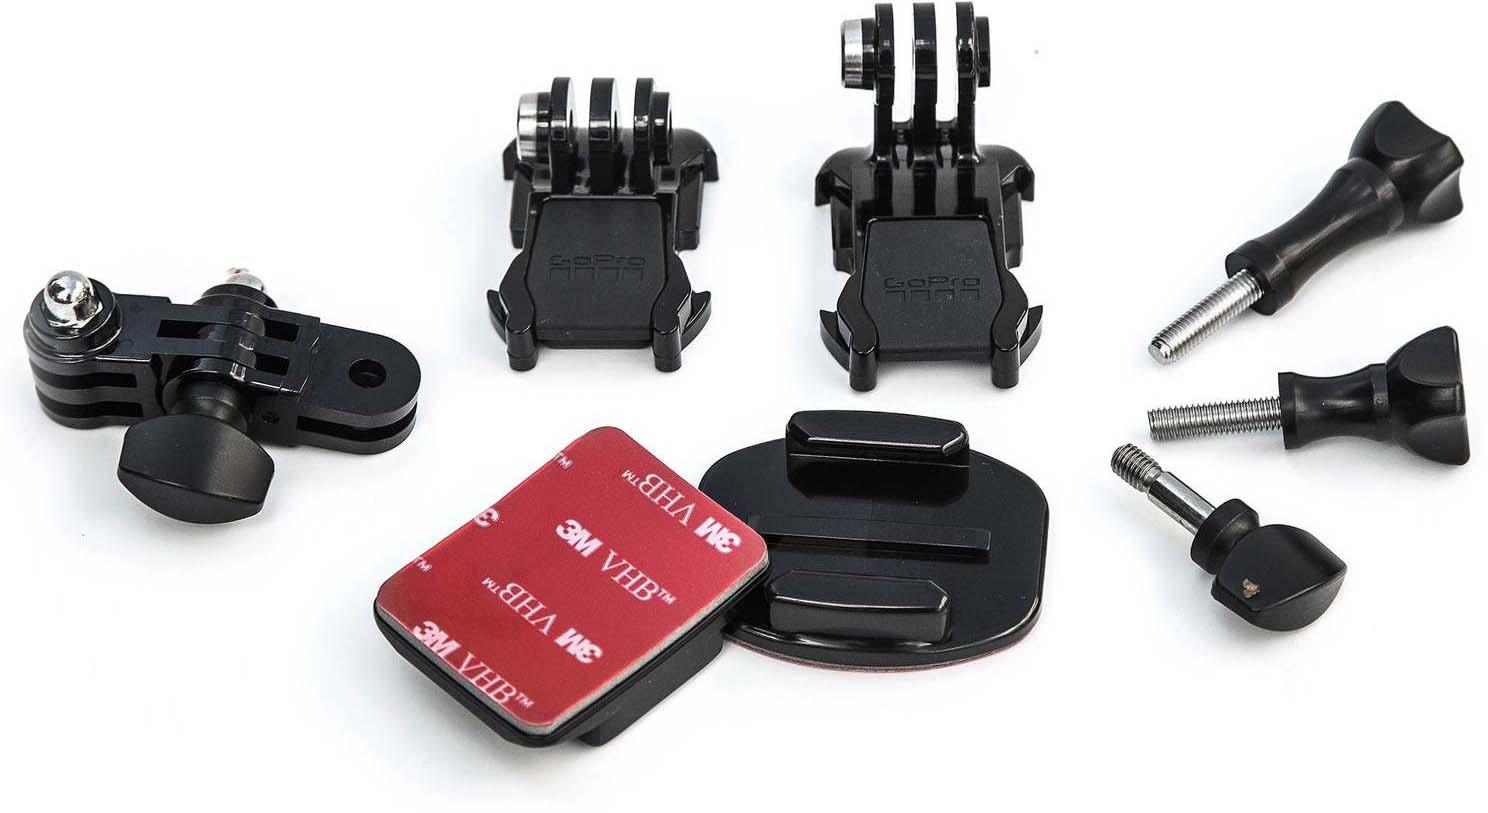 Набор креплений для камеры GoPro Grab Bag AGBAG-002, Black комплект креплений gopro grab bag agbag 002